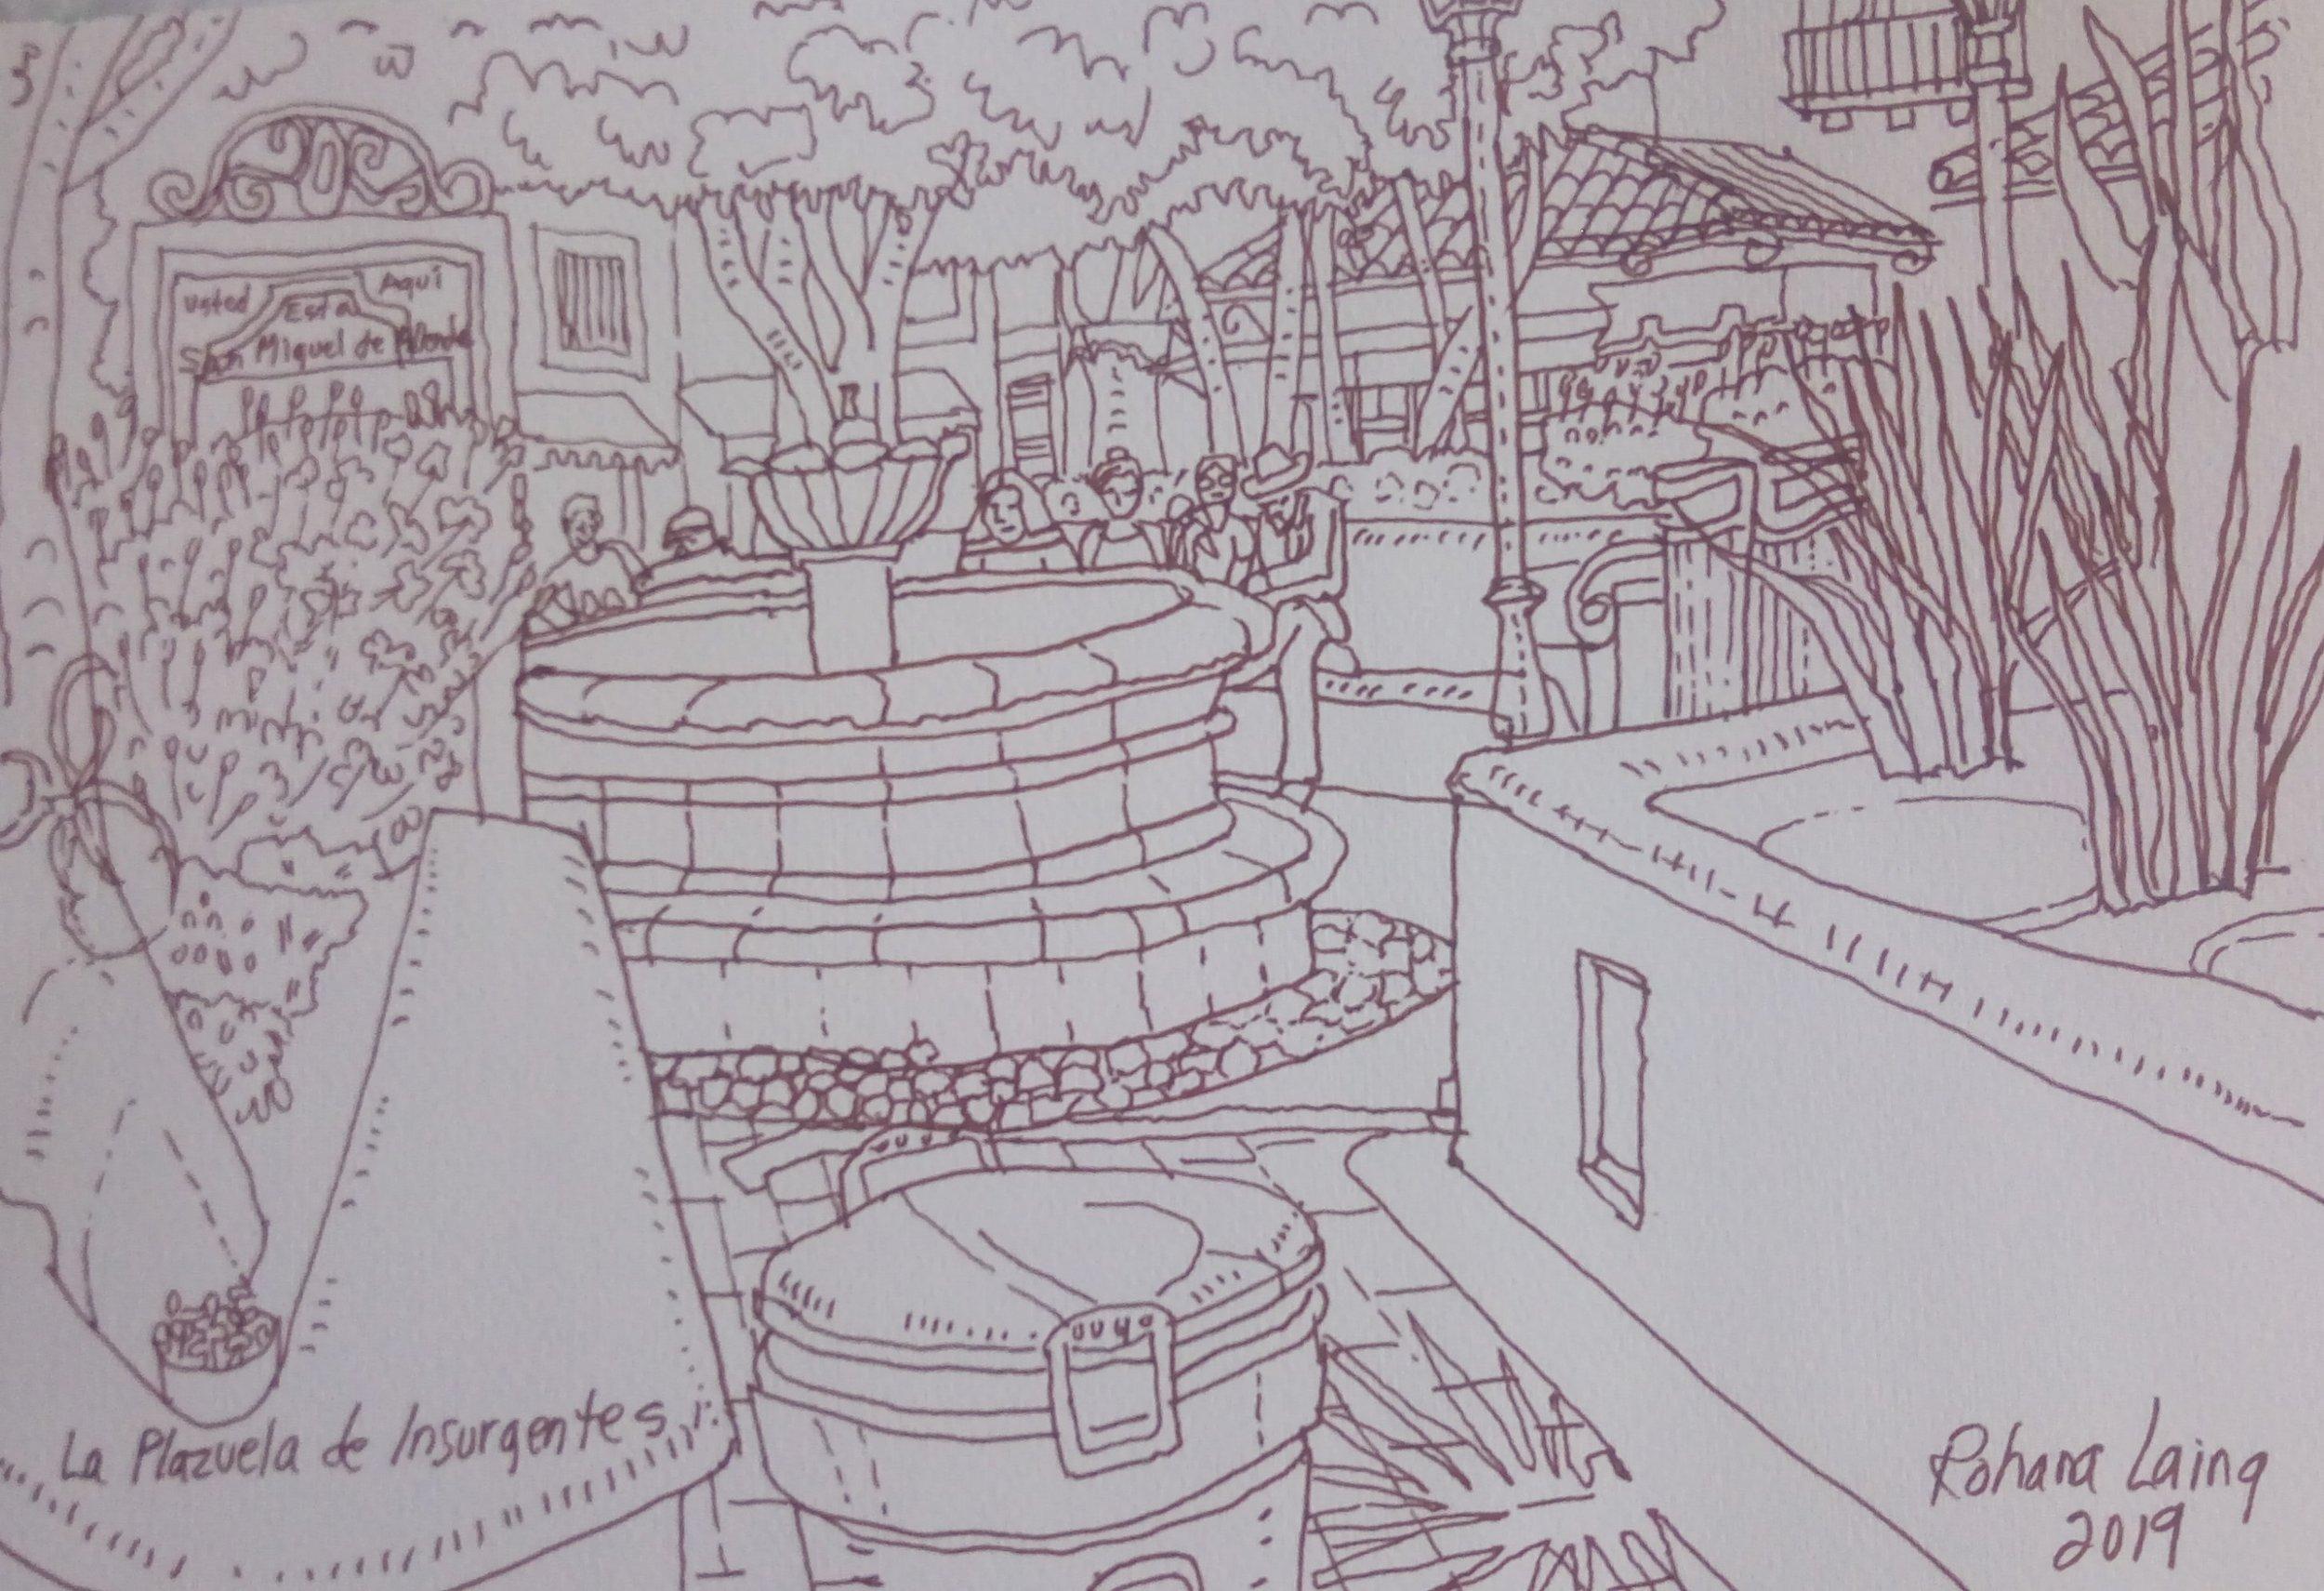 Rohana sketch.jpg